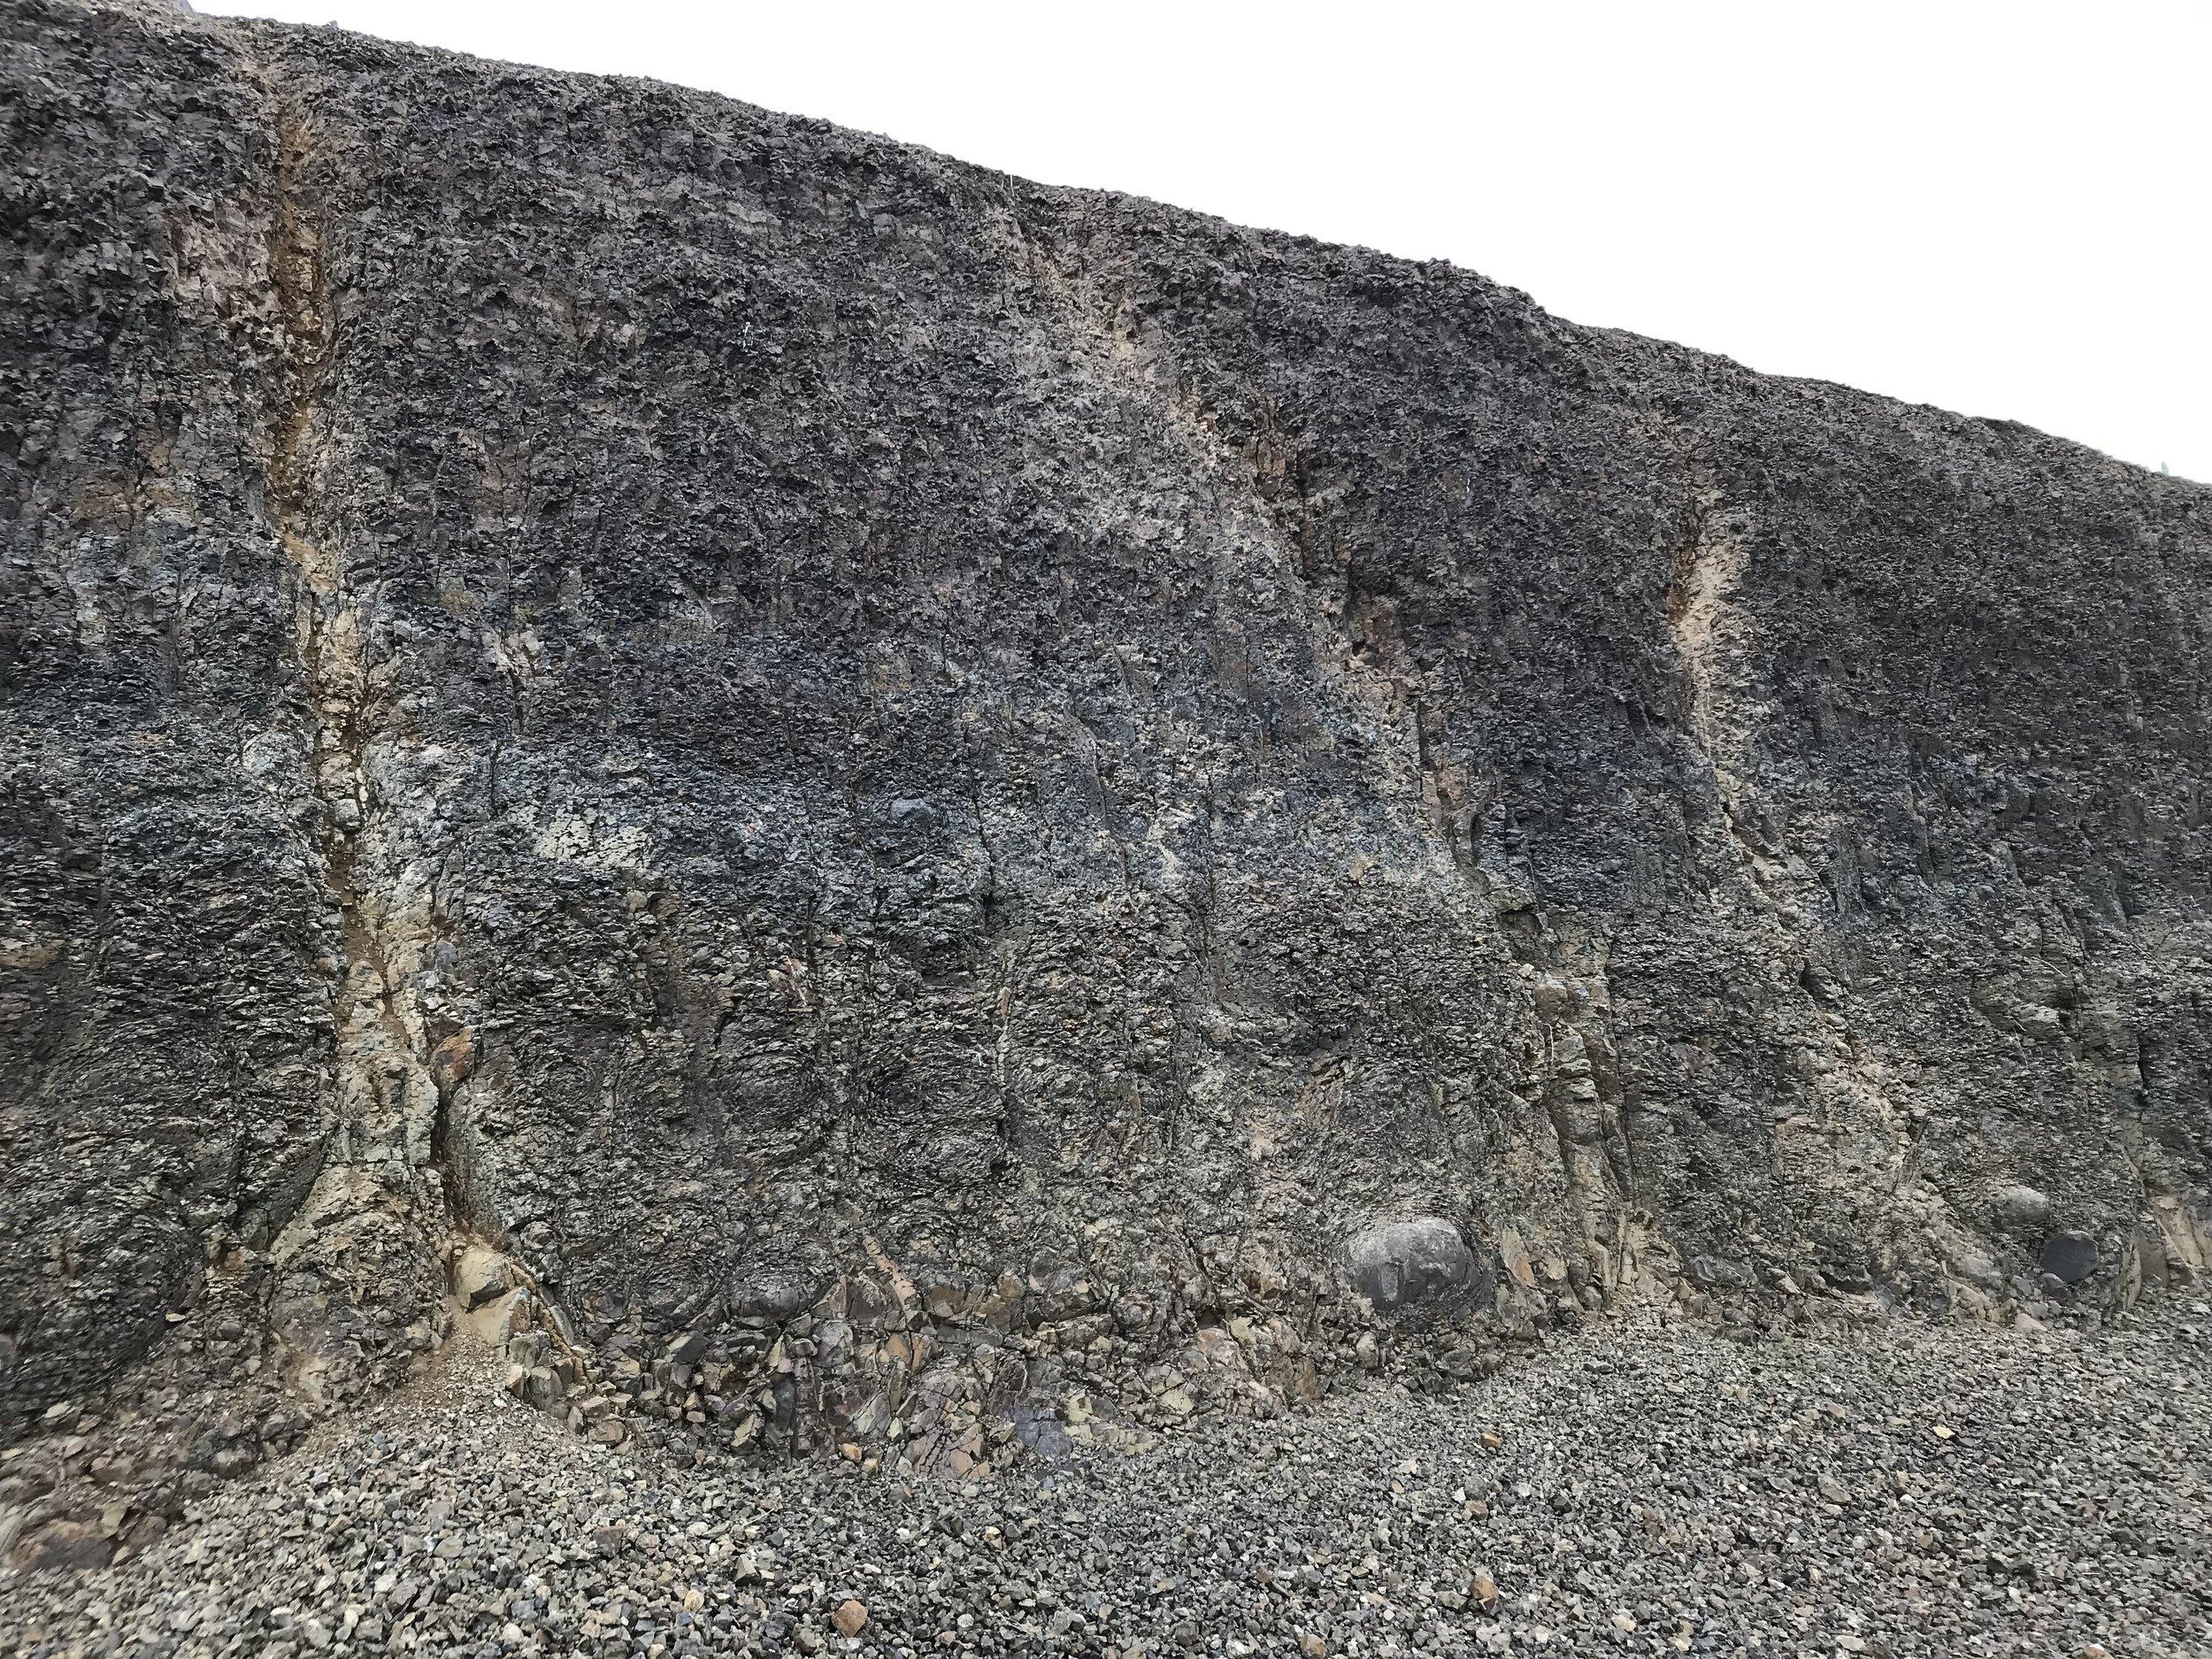 towering rock formation in the Ferguson Vineyard in the Sevein Vineyard Development, adjacent to Seven Hills